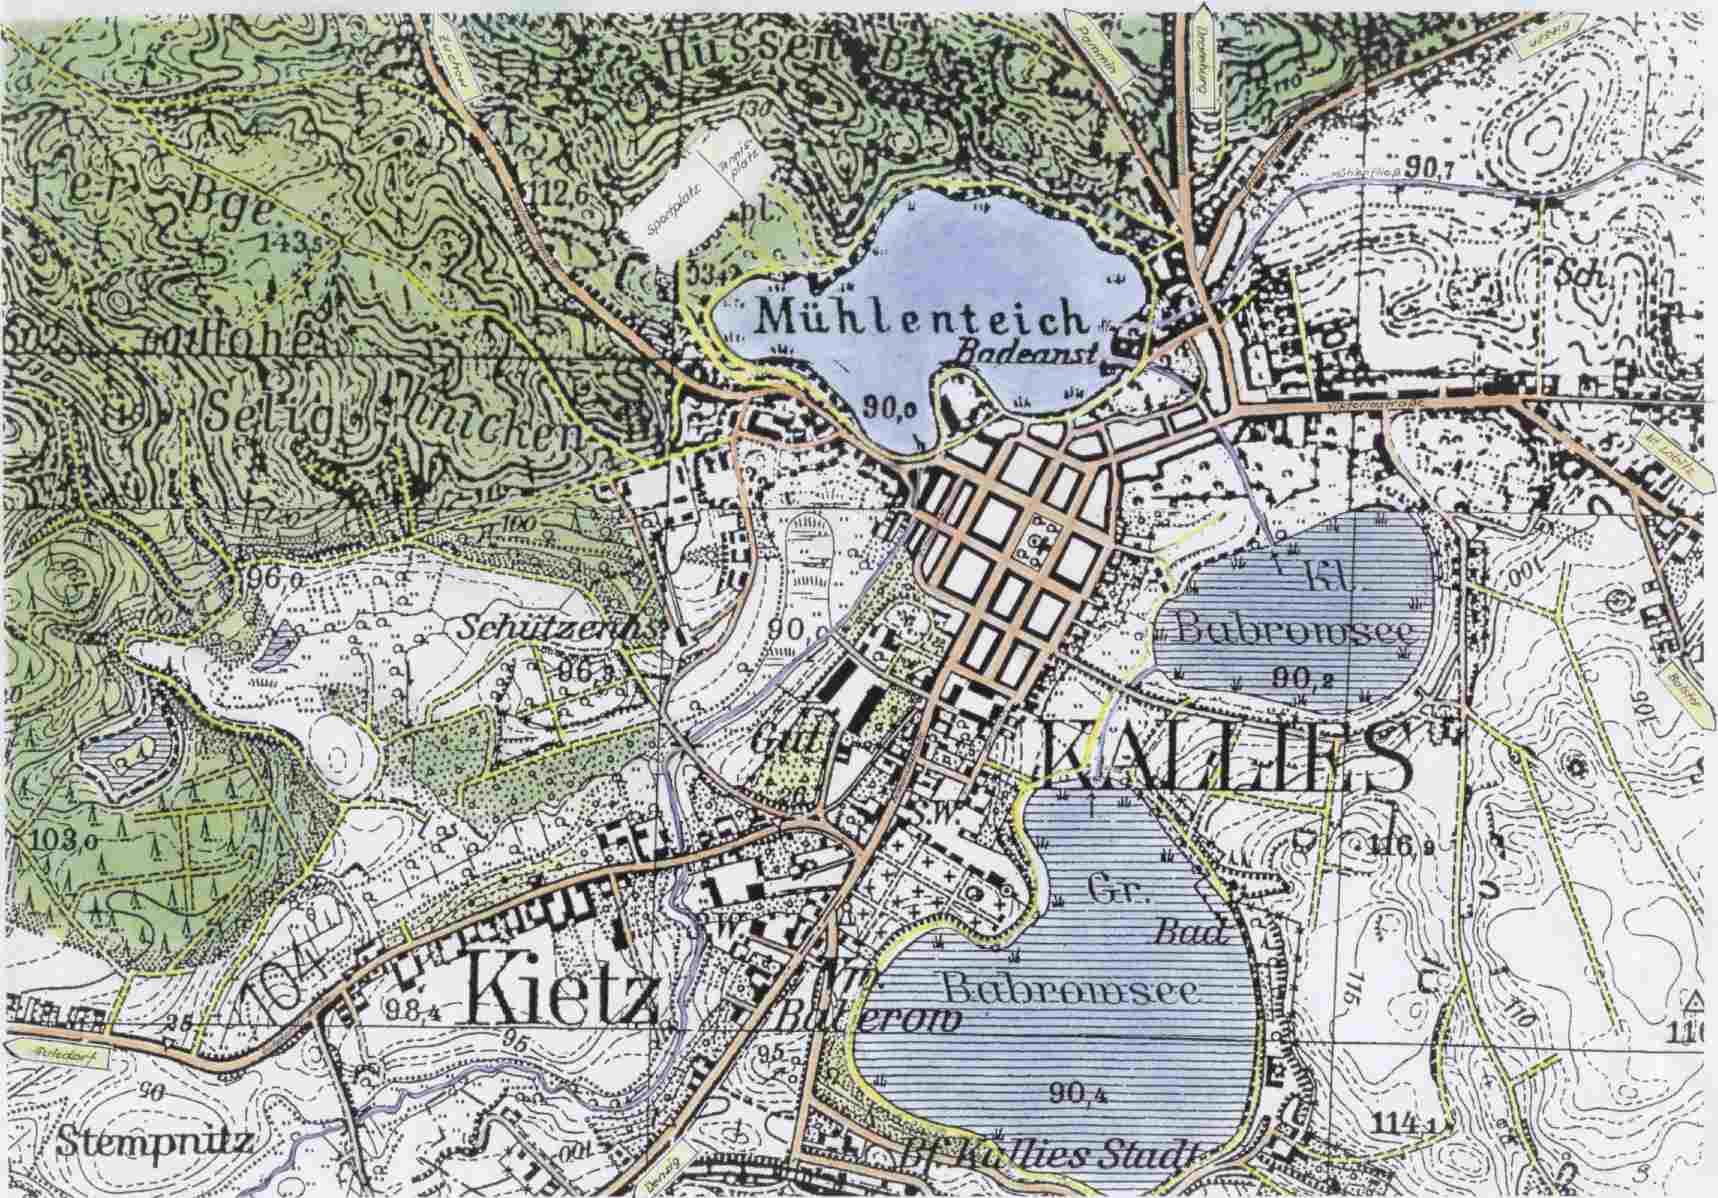 Pommern Karte Vor 1945.Stadt Kallies